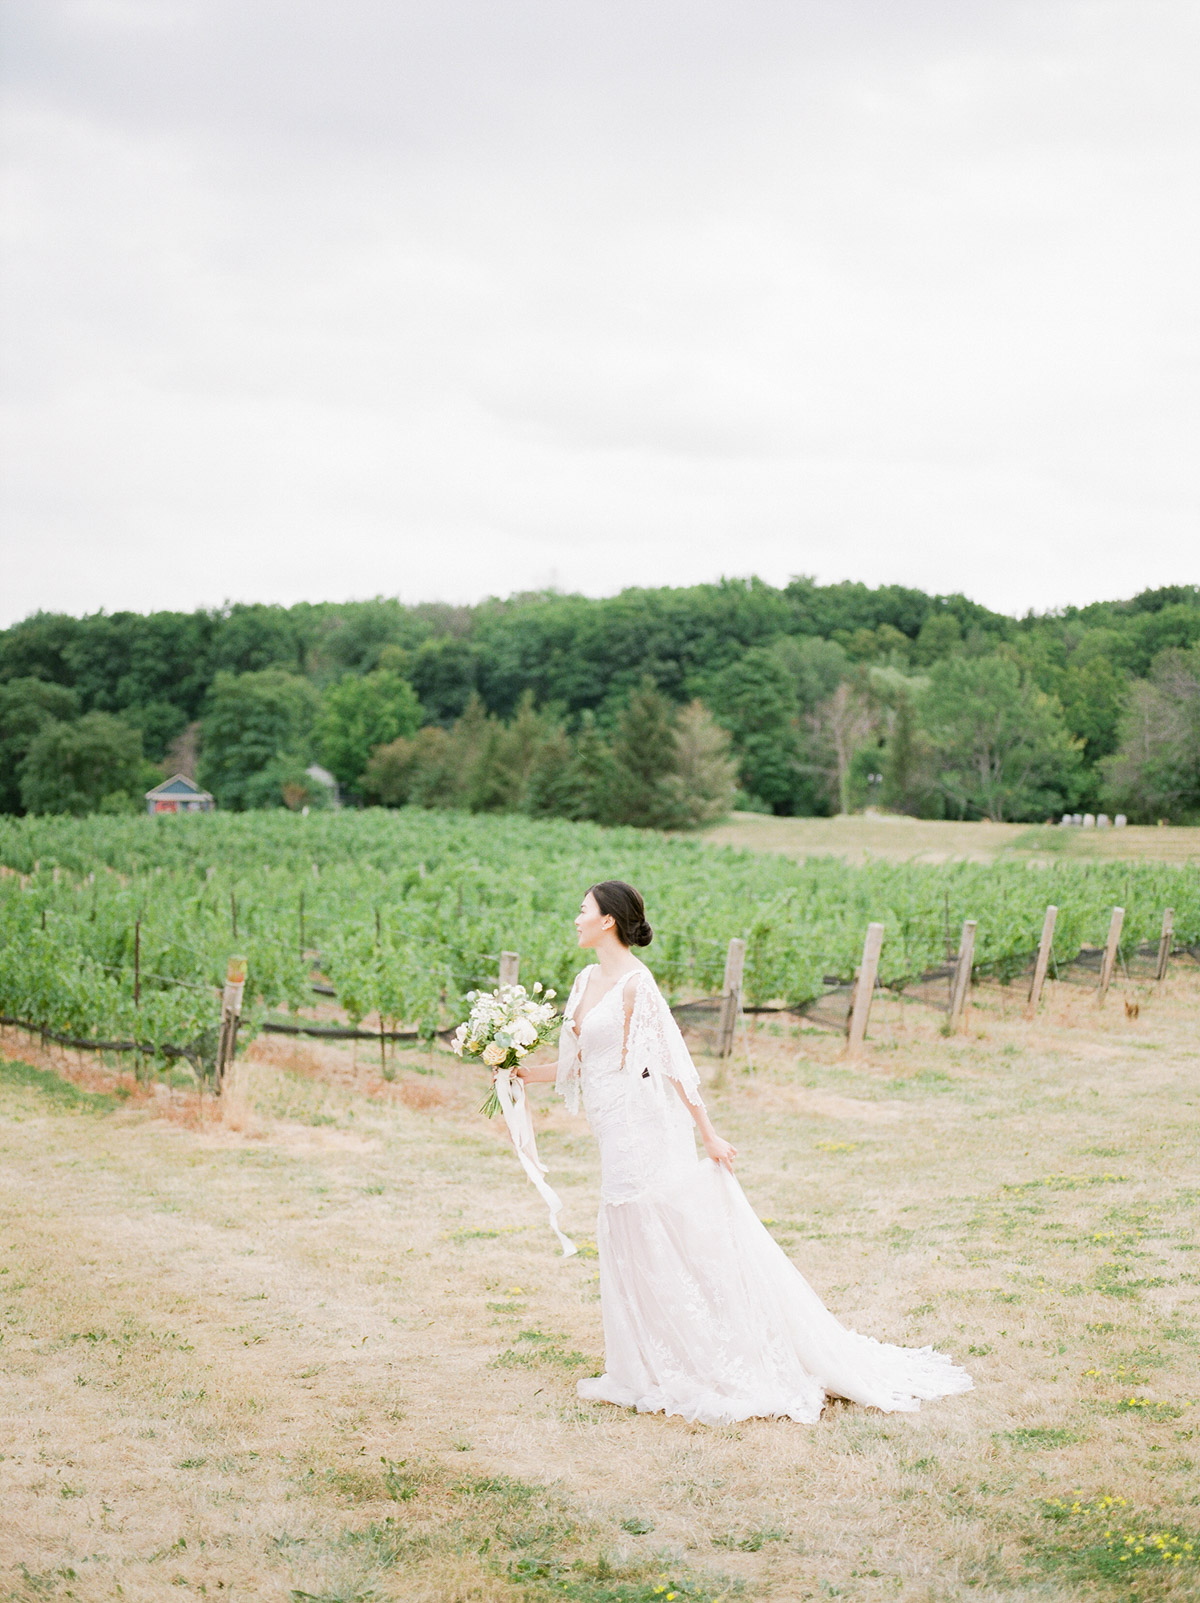 jennifer-xu-photography-vineyard-bride-swish-list-rosewod-eatstes-winery-beamsville-wedding-editorial-32.jpg